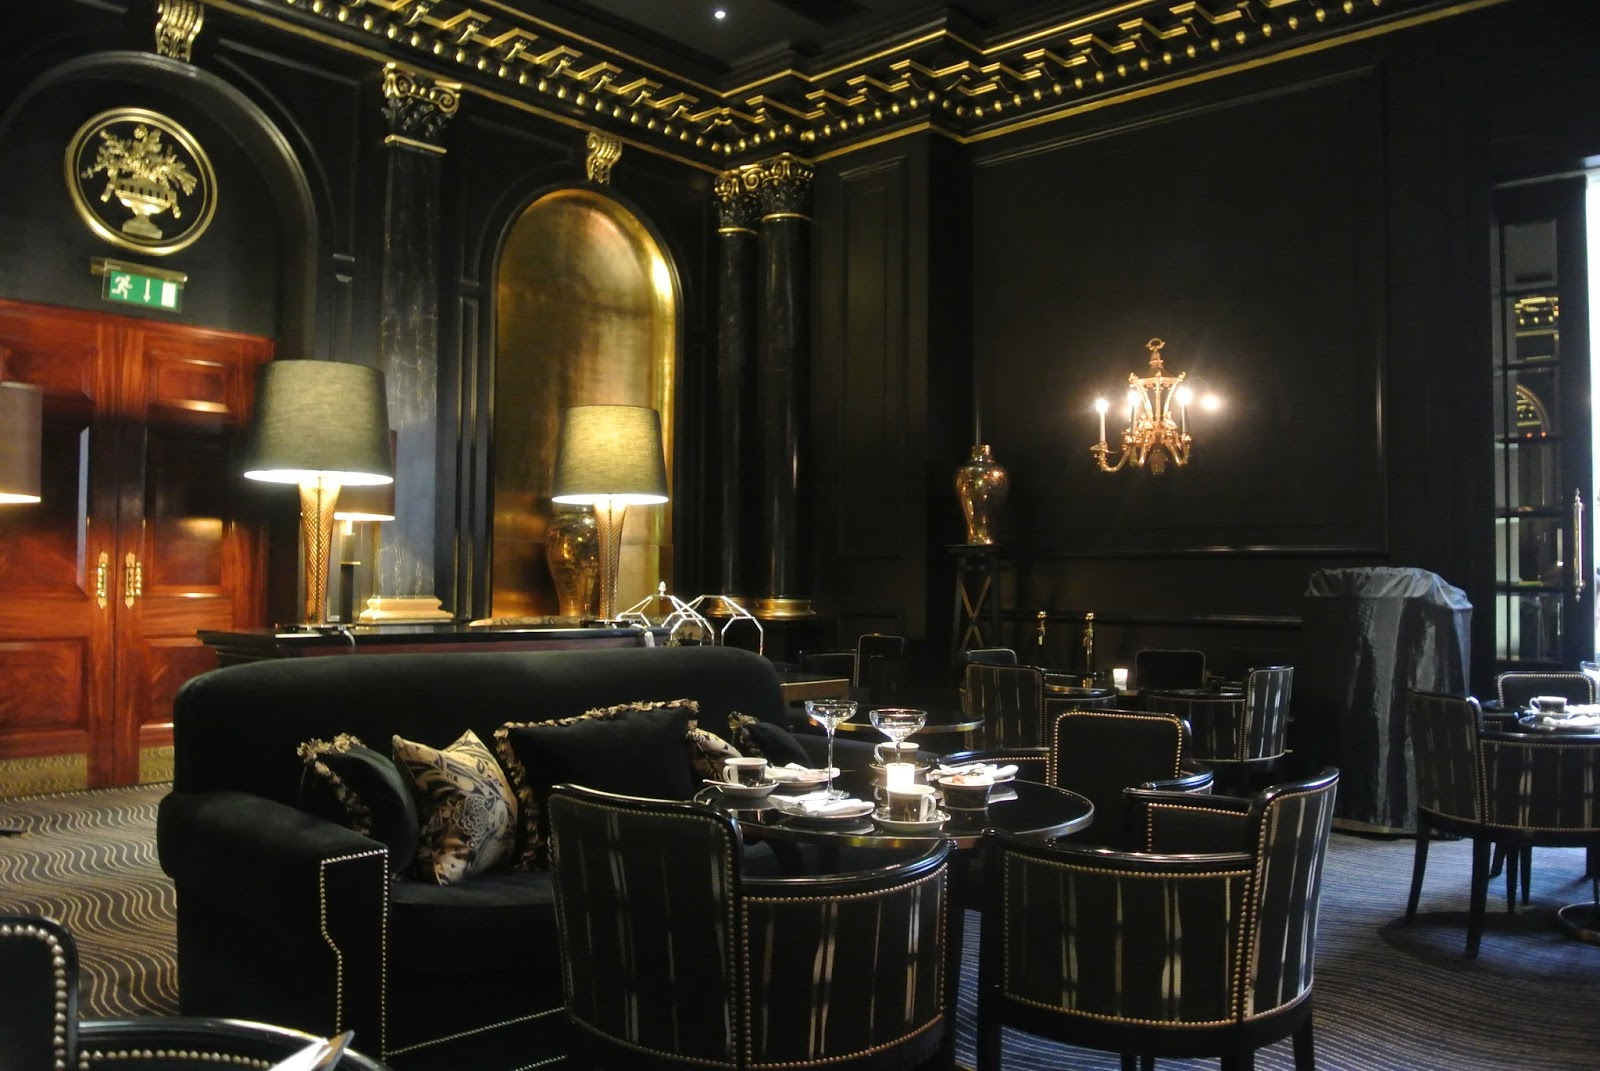 image savoy hotel bar - photo #7